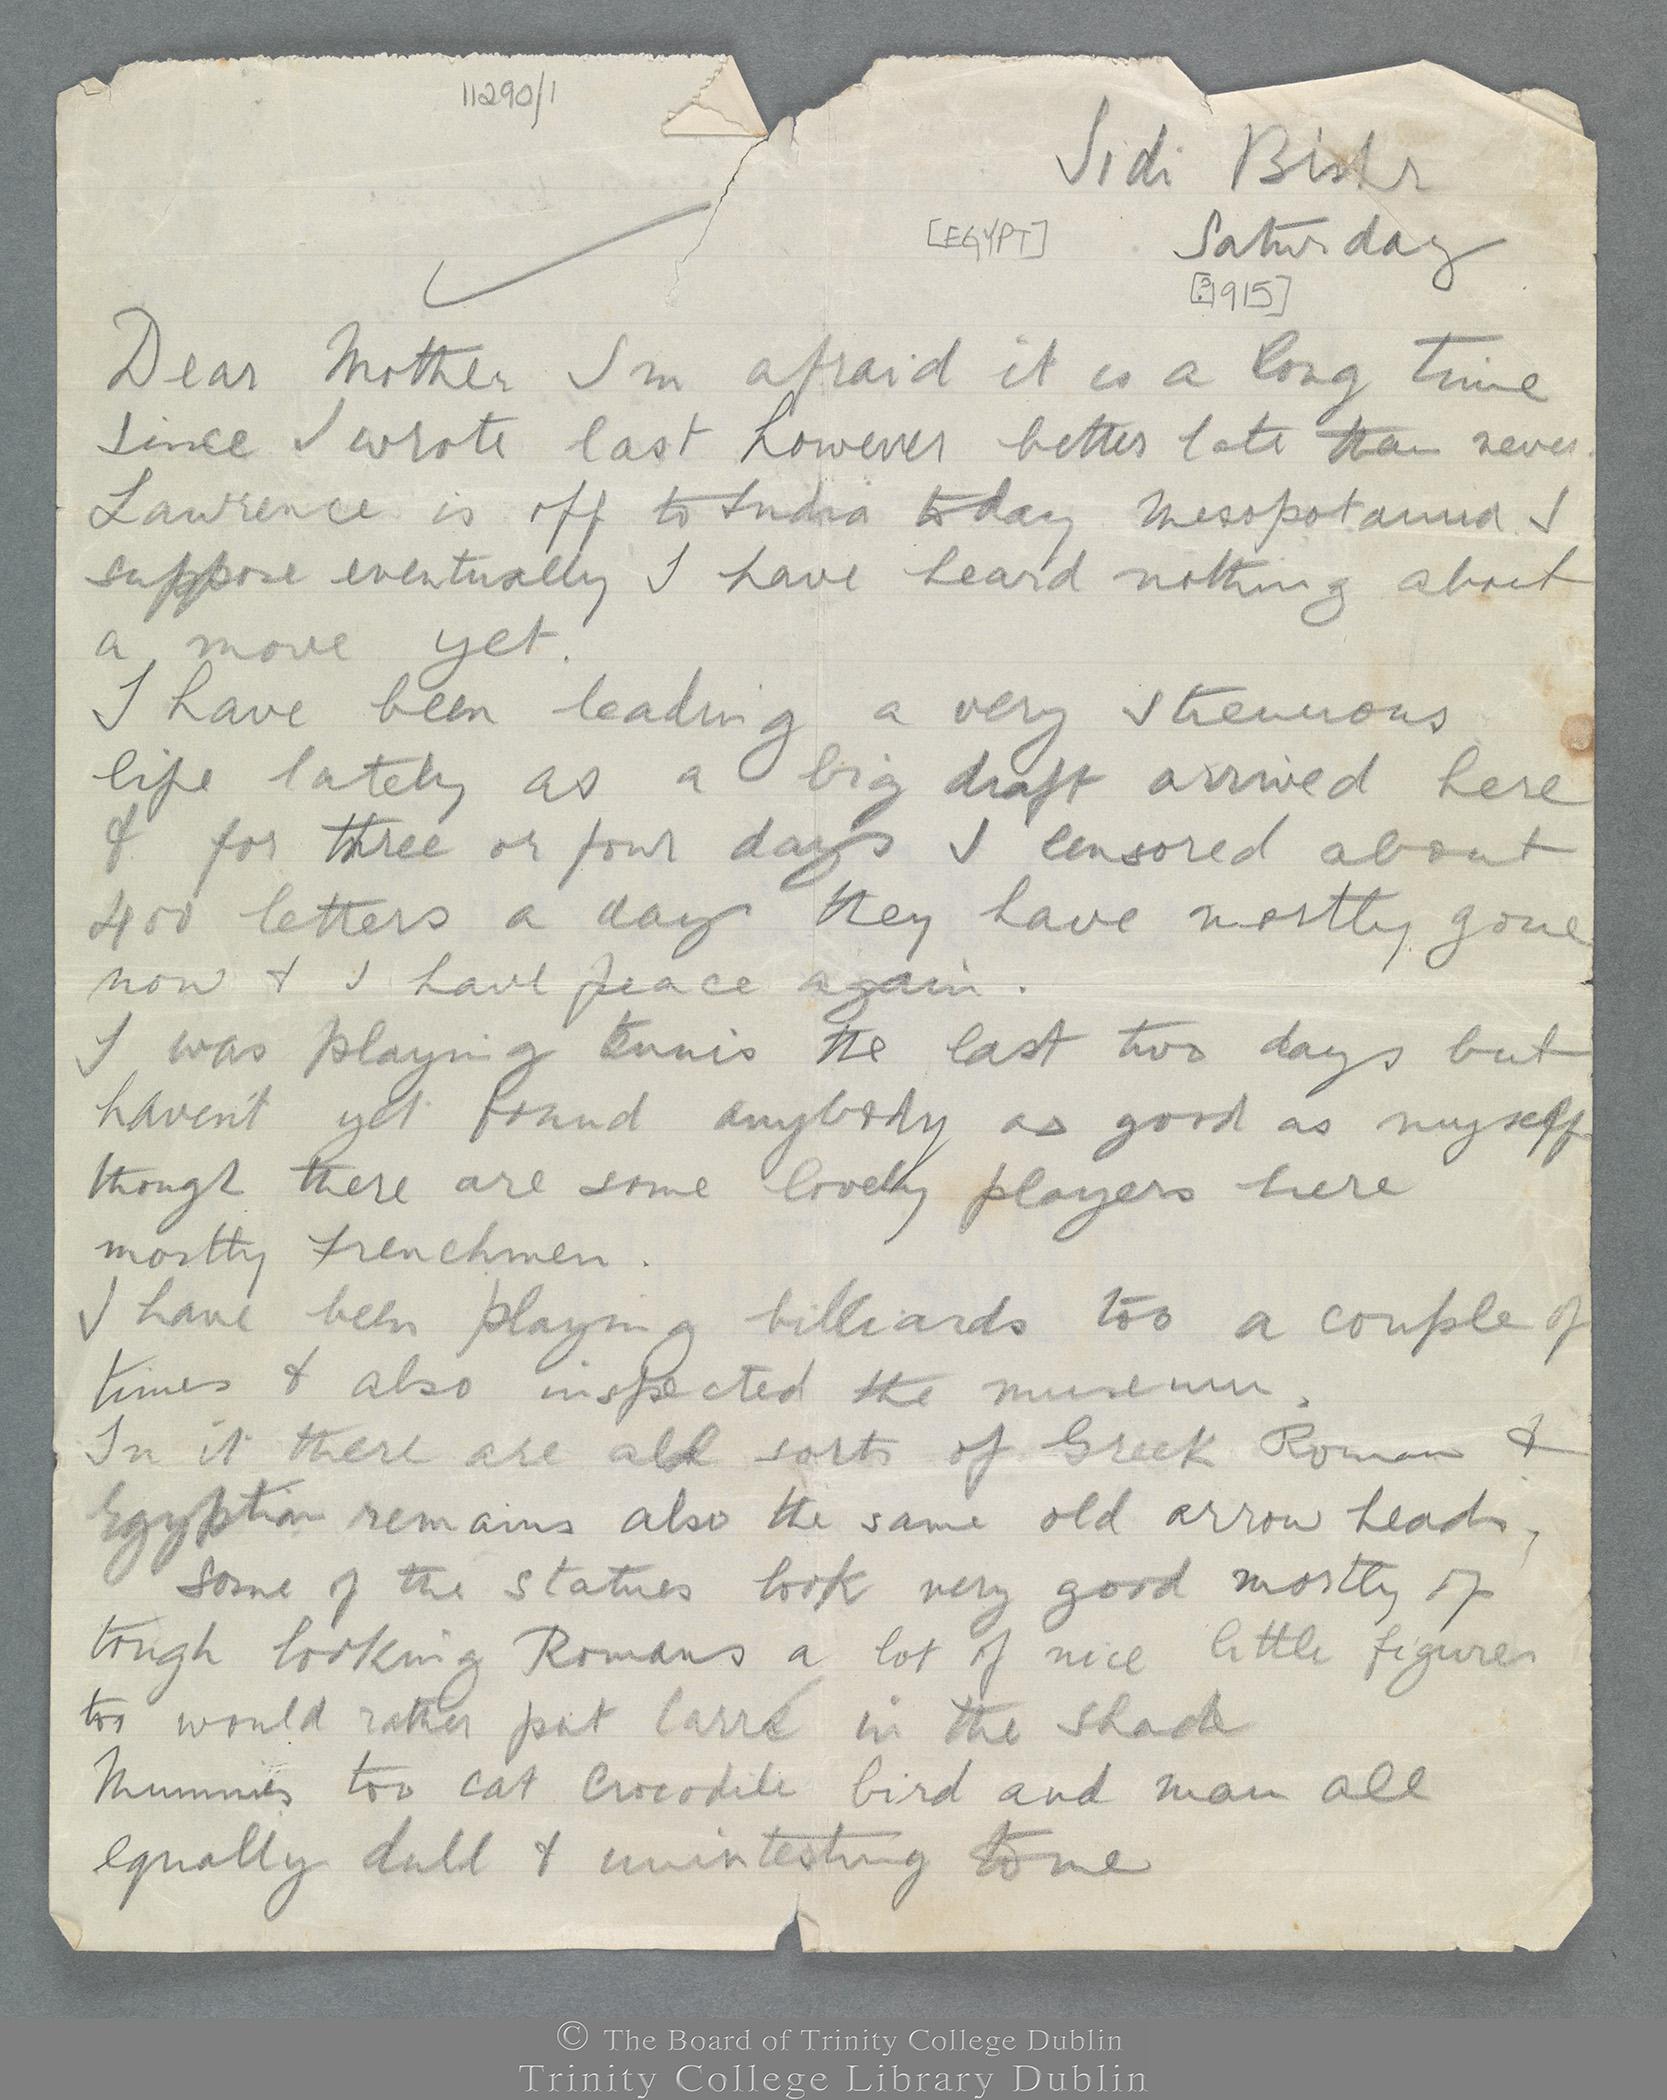 TCD MS 11290/1 folio 1 recto